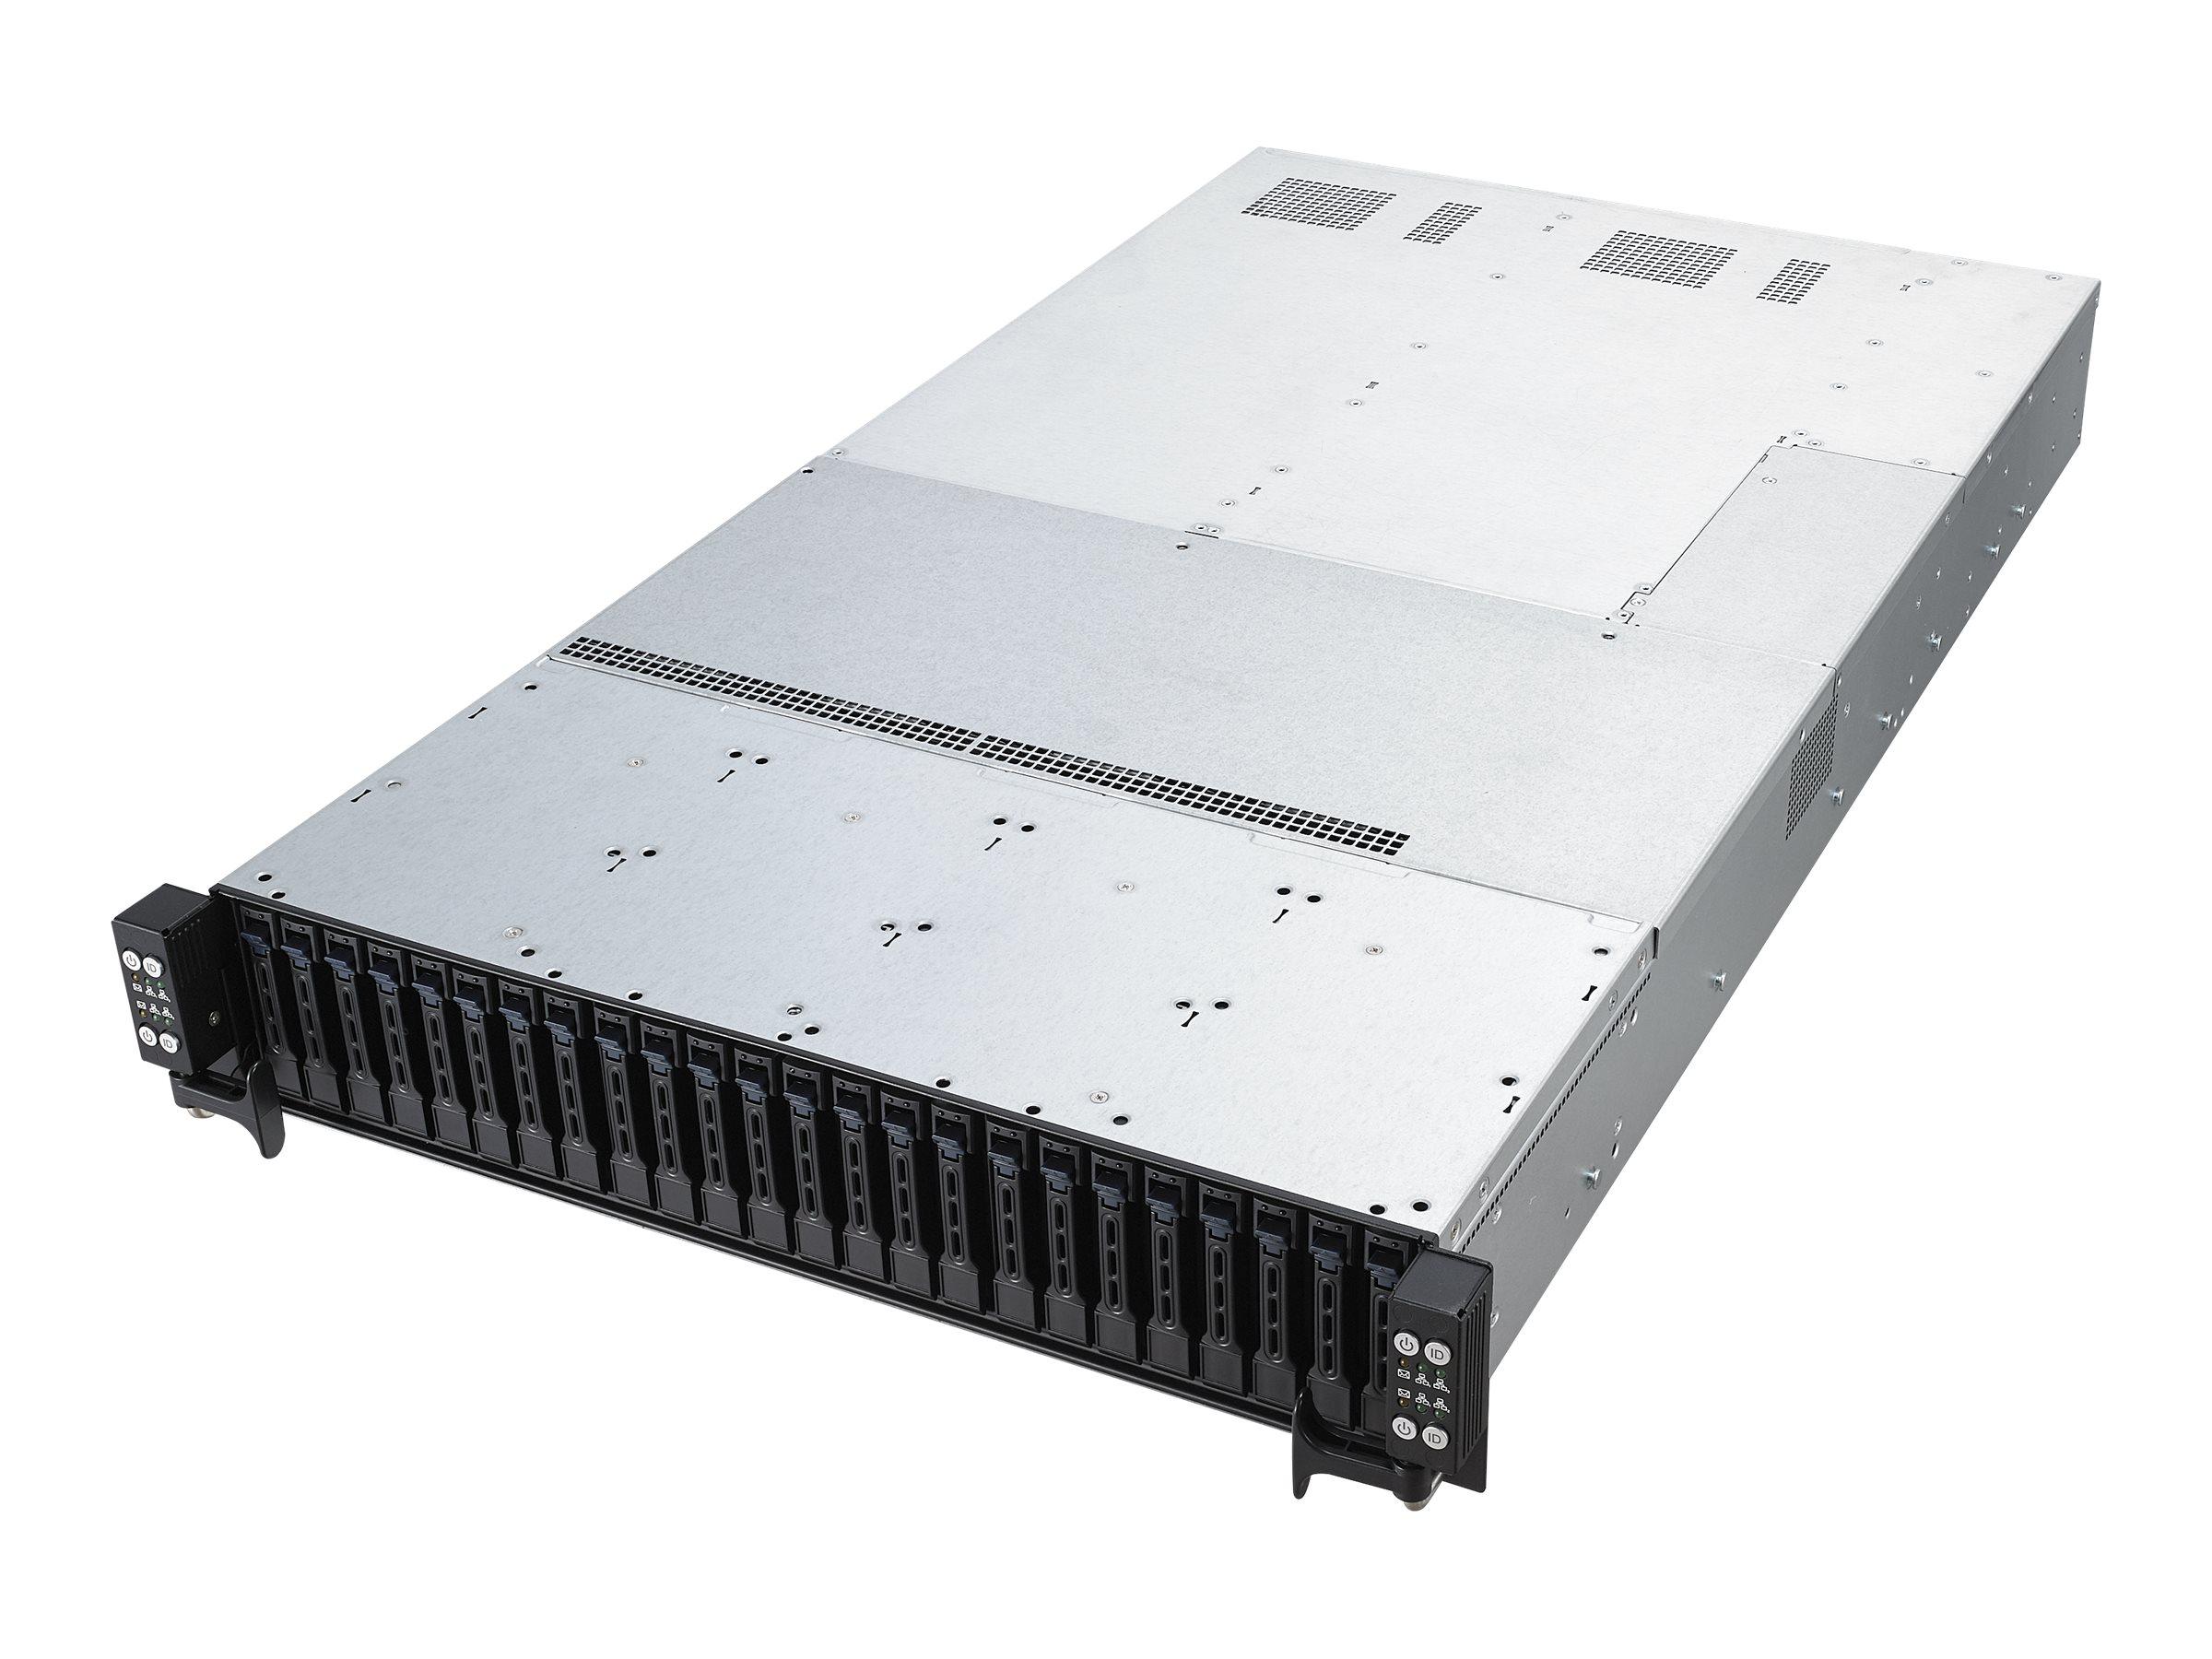 "ASUS RS720Q-E9-RS24-S - 4 Knoten - Cluster - Rack-Montage - 2U - zweiweg - keine CPU - RAM 0 GB - Hot-Swap 6.4 cm (2.5"")"